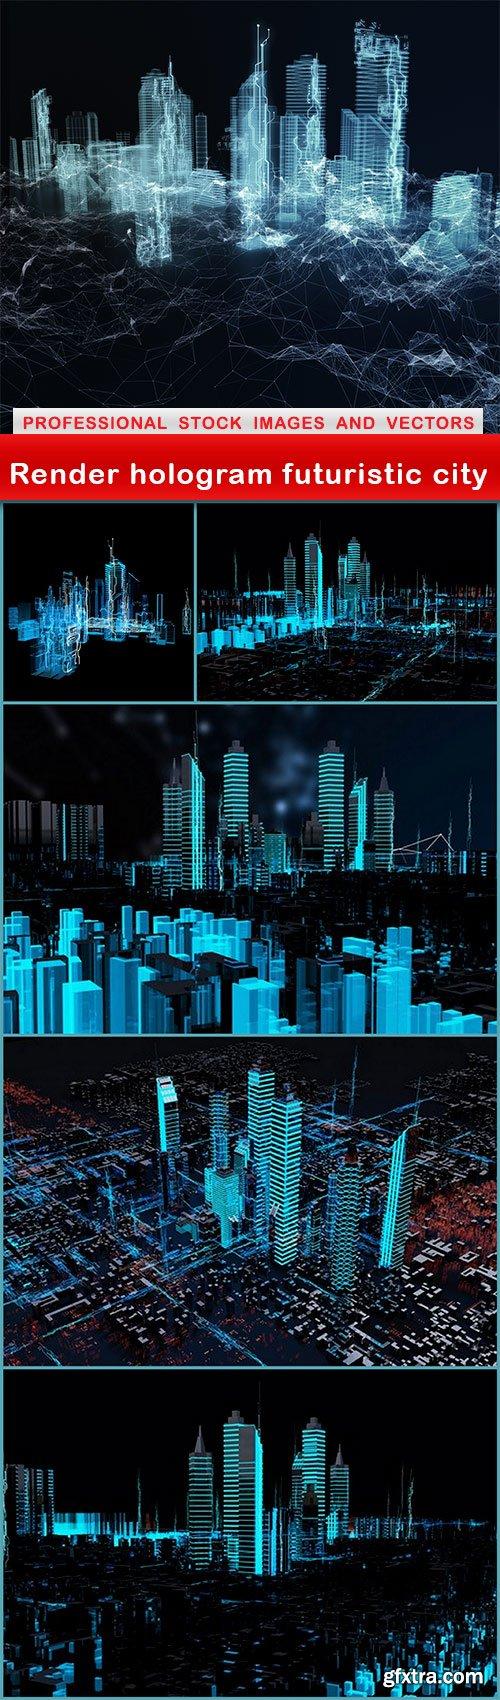 Render hologram futuristic city - 6 UHQ JPEG